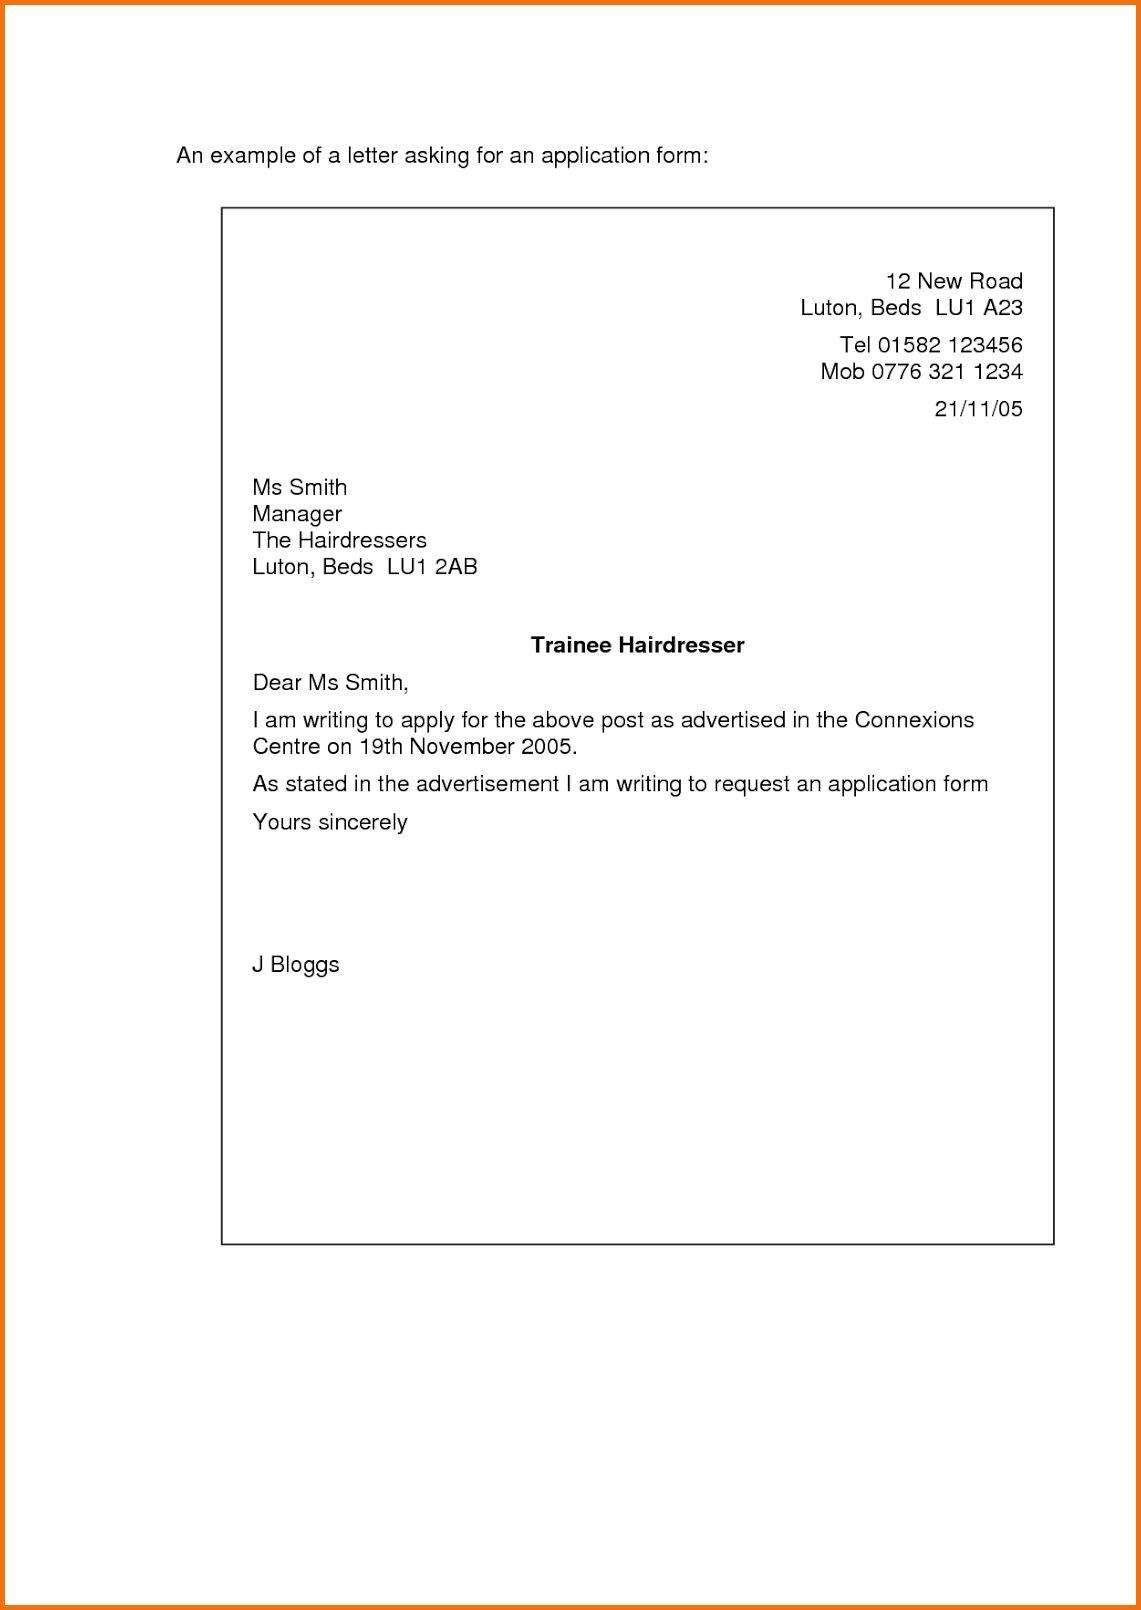 23 Short Cover Letter In 2020 Job Application Cover Letter